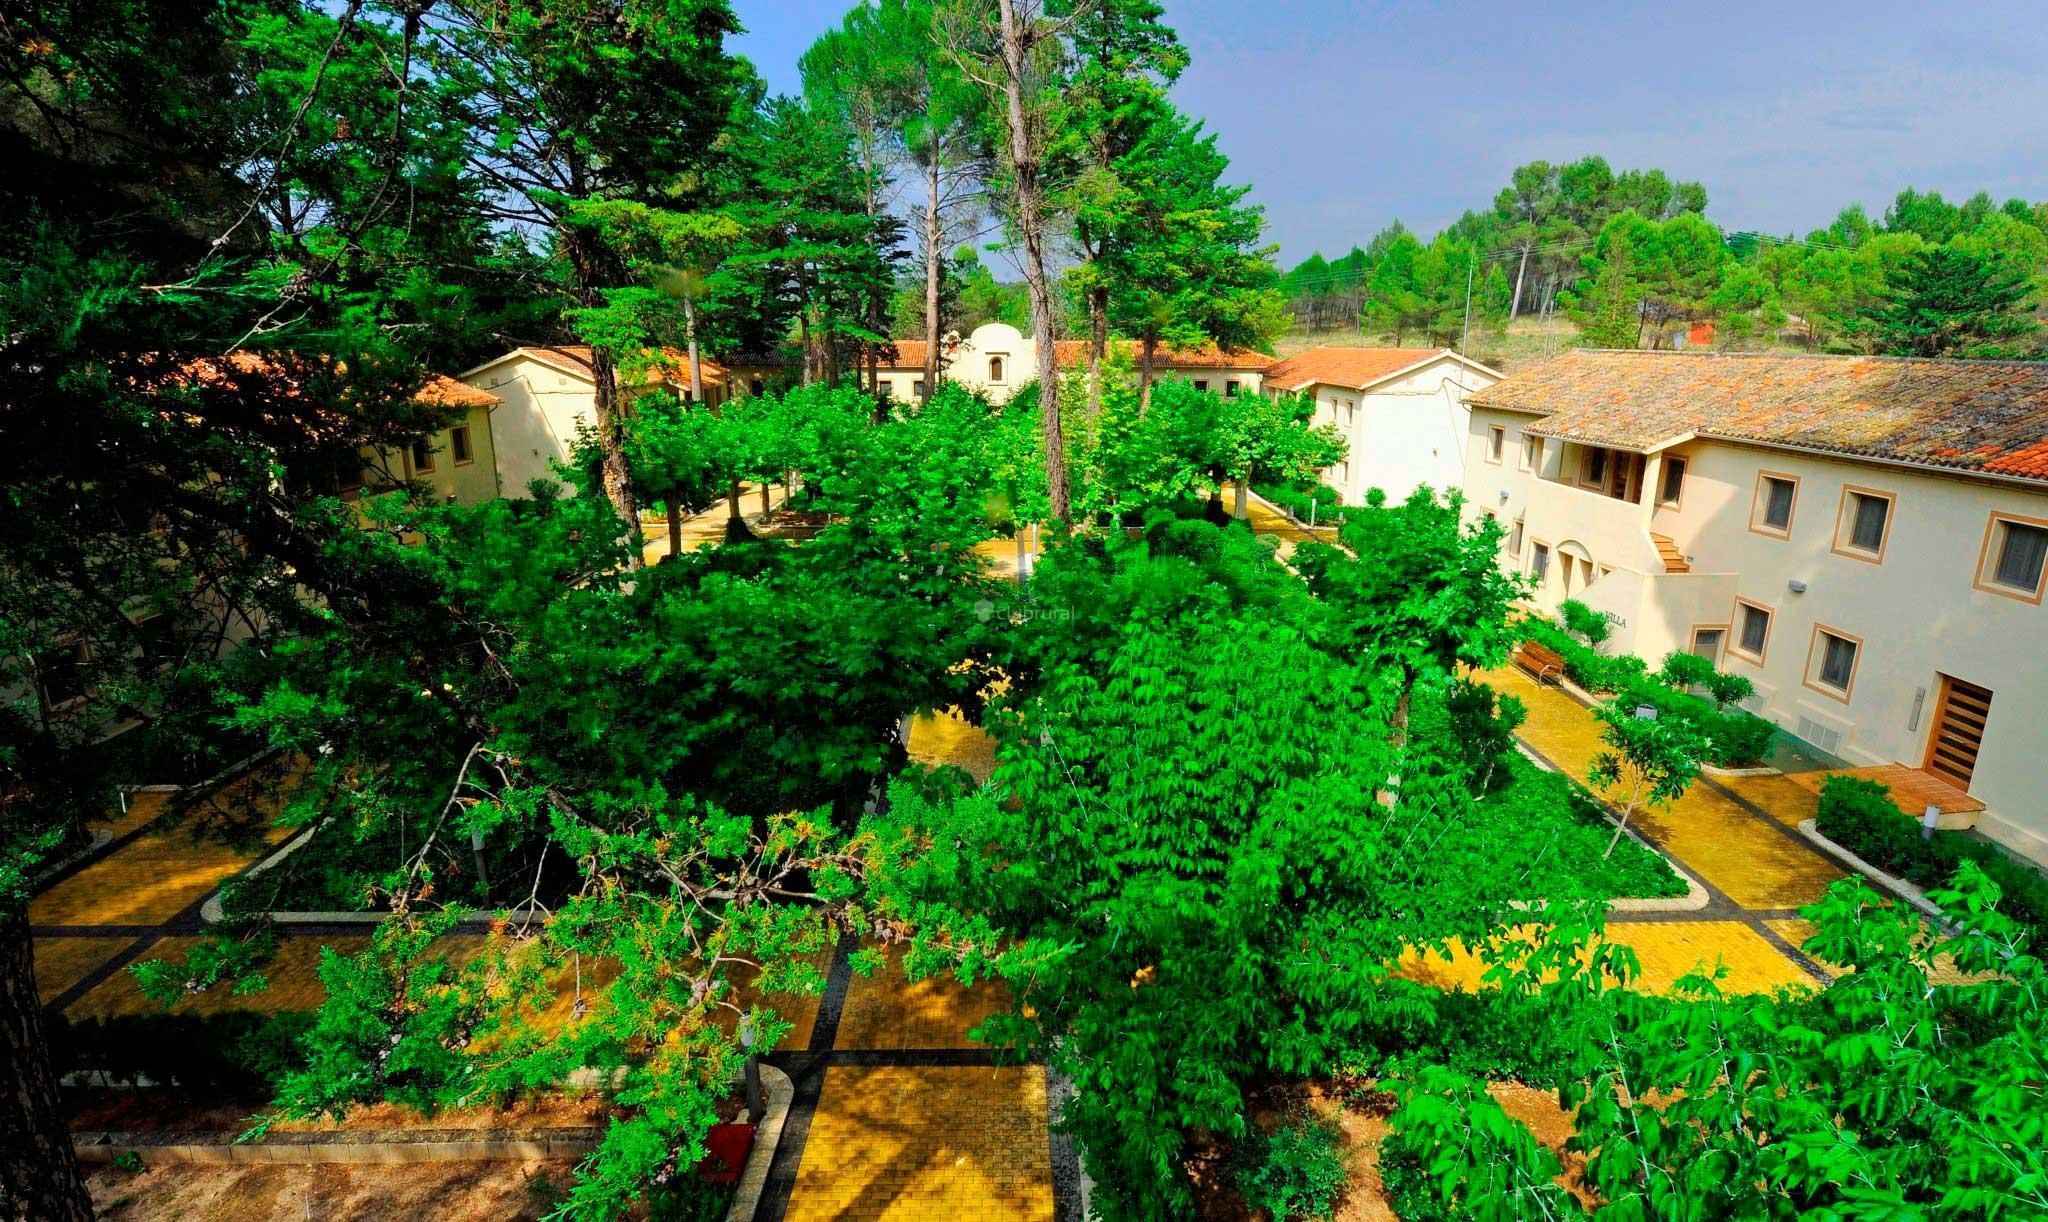 Fotos de albergue rural hervideros valencia cofrentes clubrural - Casa rural cofrentes ...